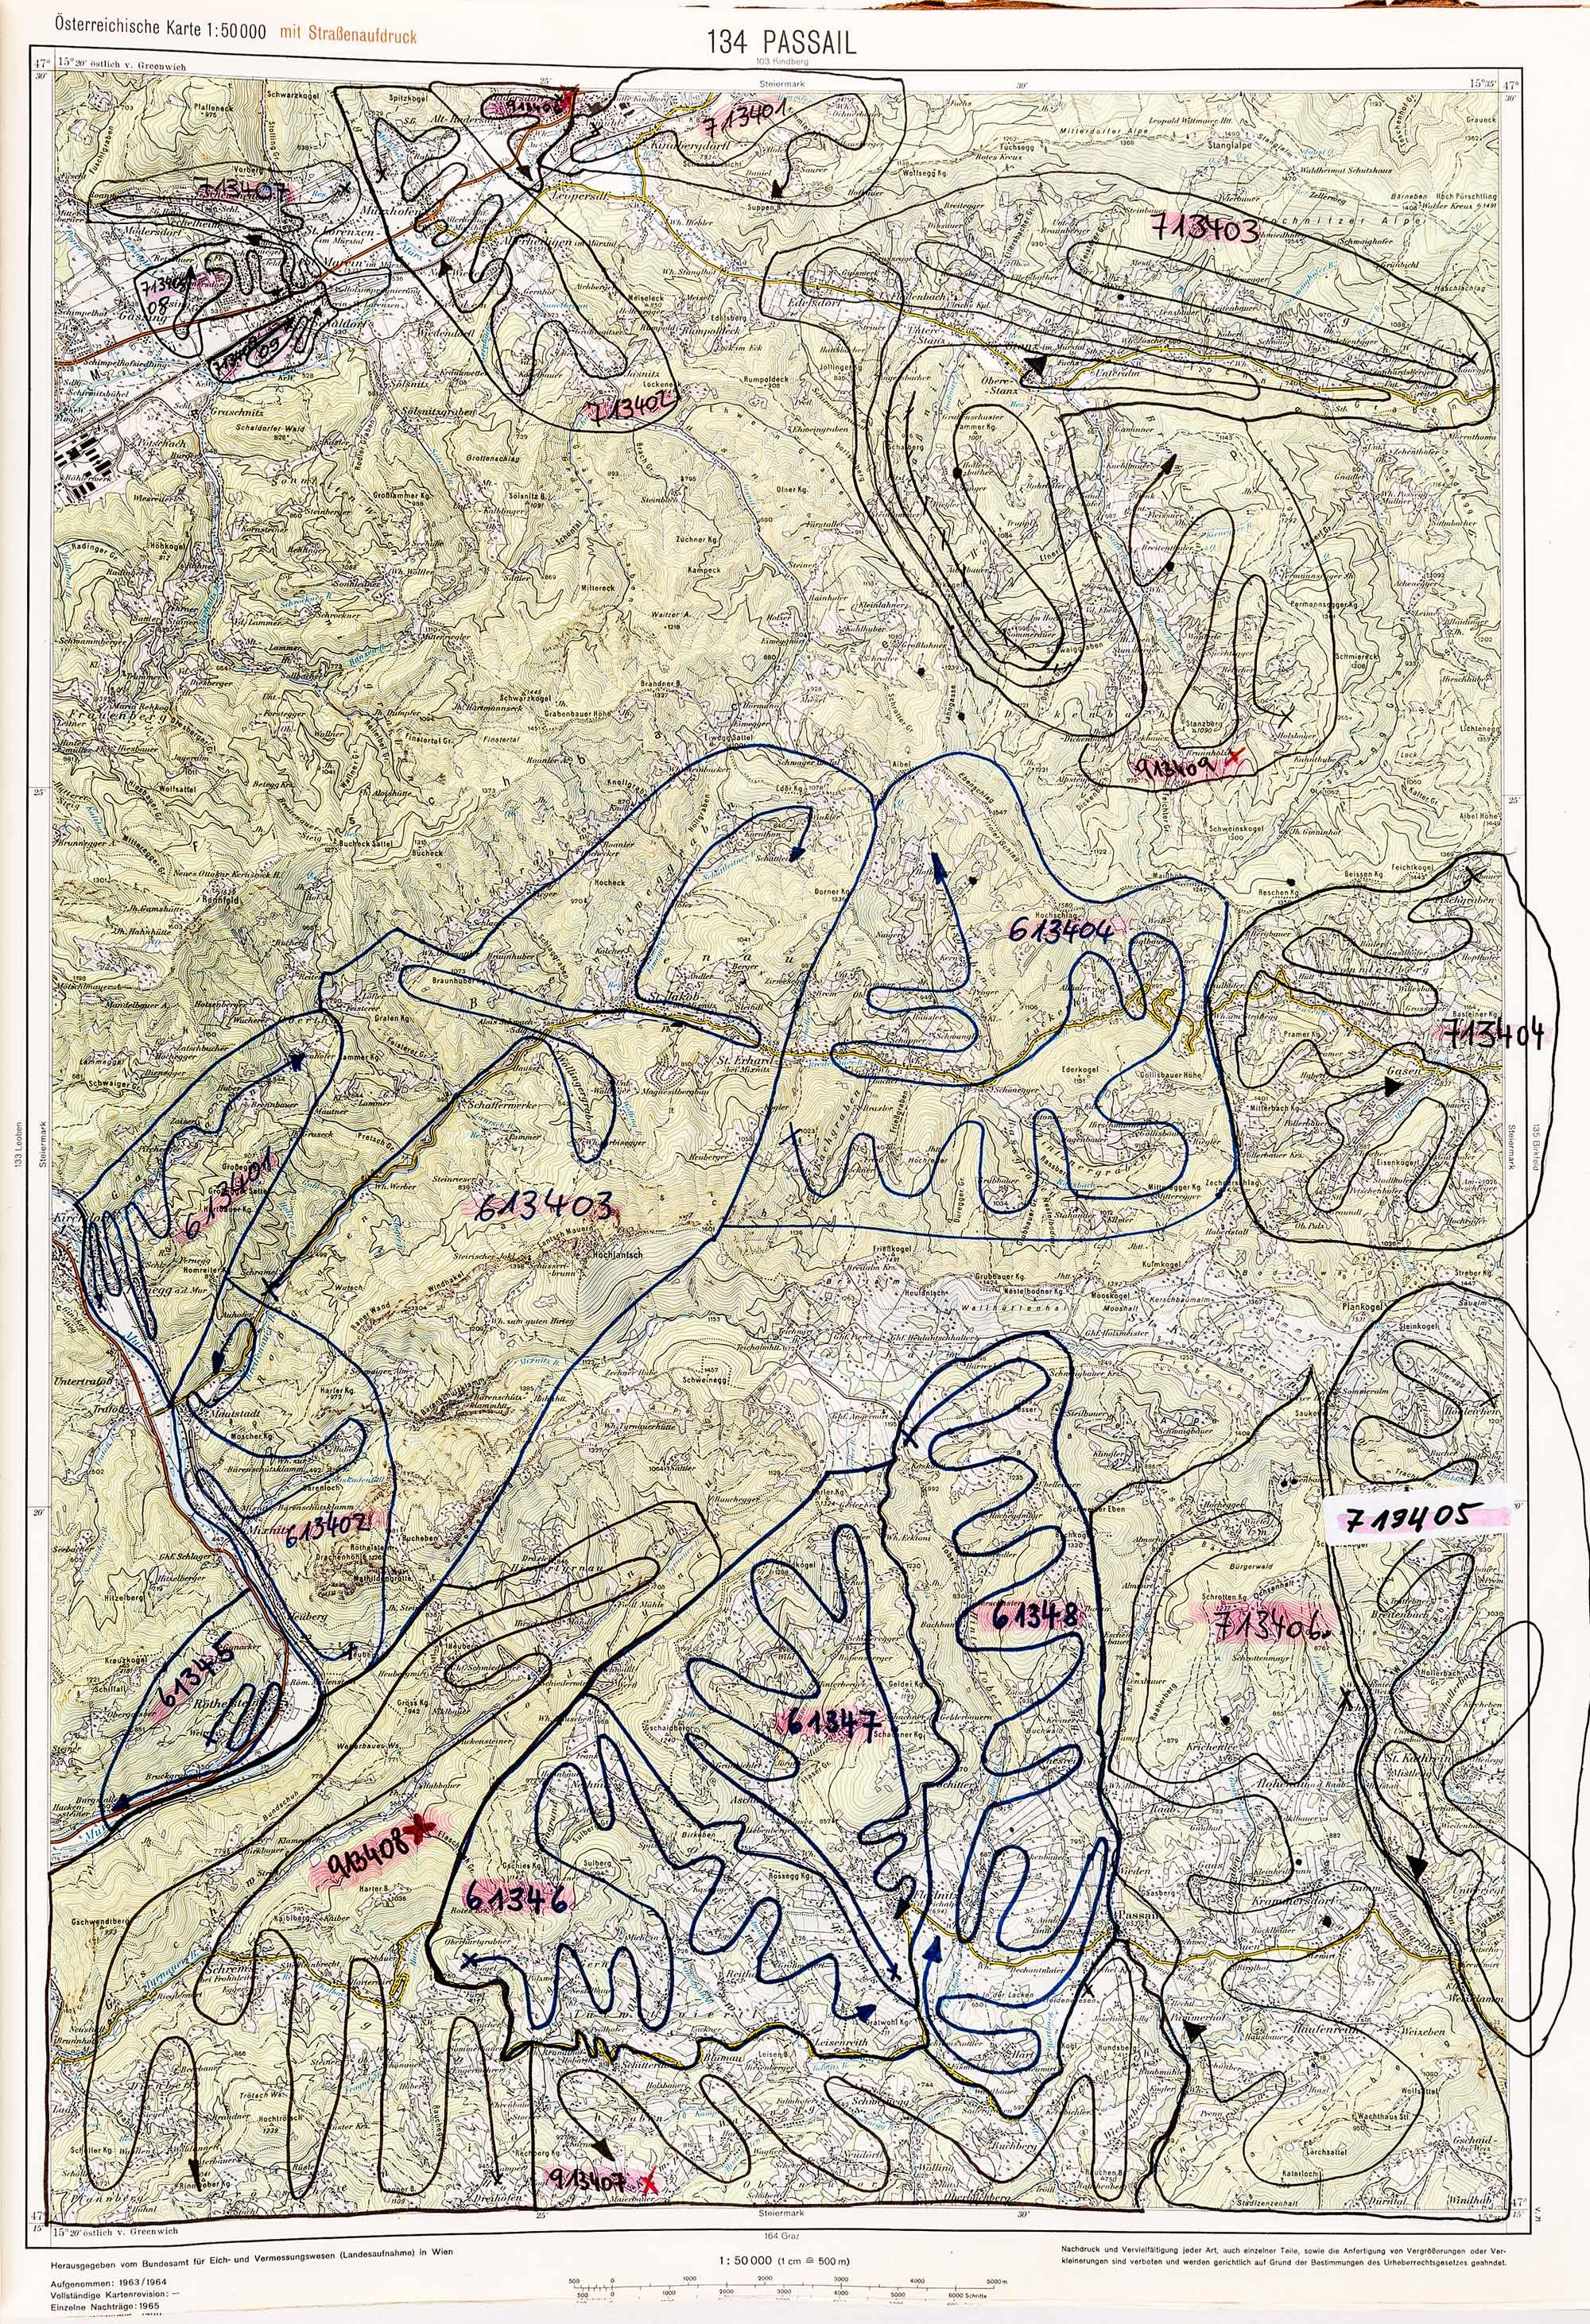 1975-1979 Karte 134